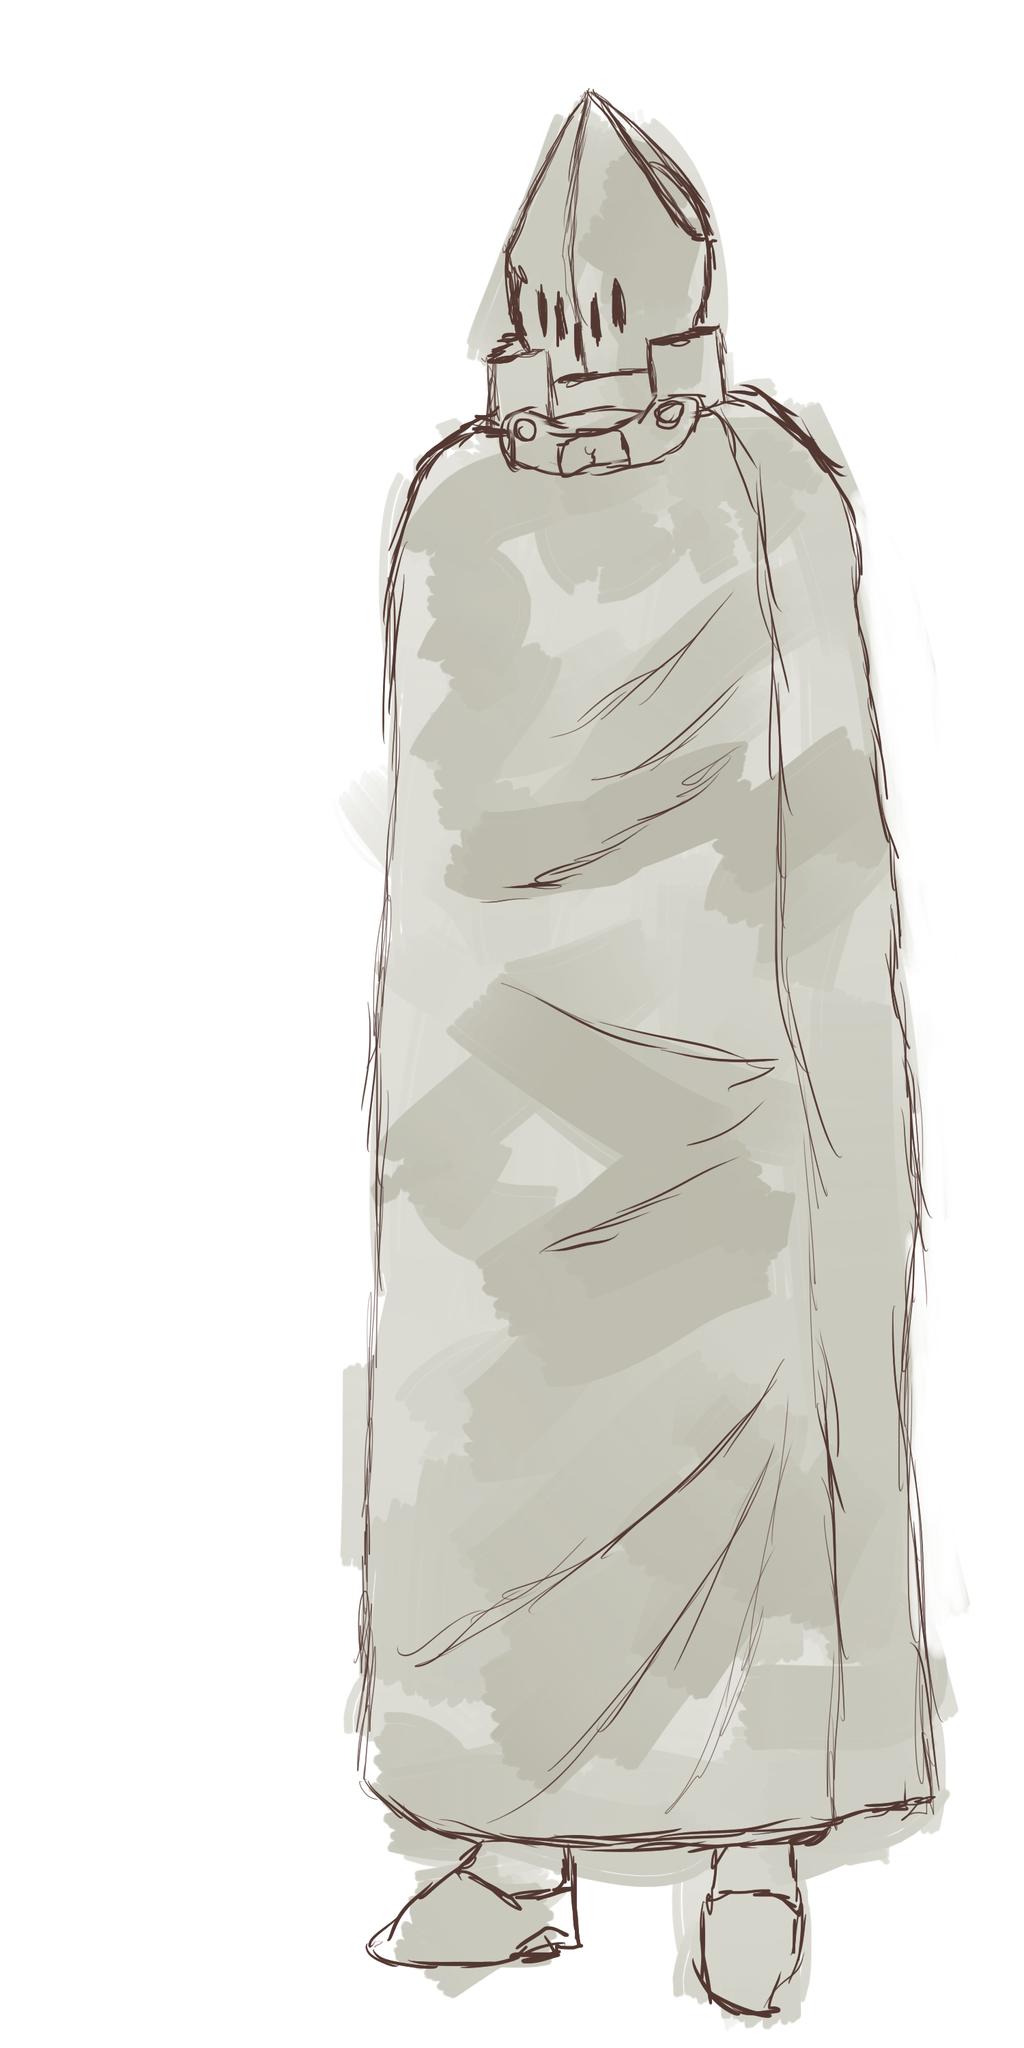 Lyorta Concept Art: Azurian Air Guard With Cloak by JayceRan